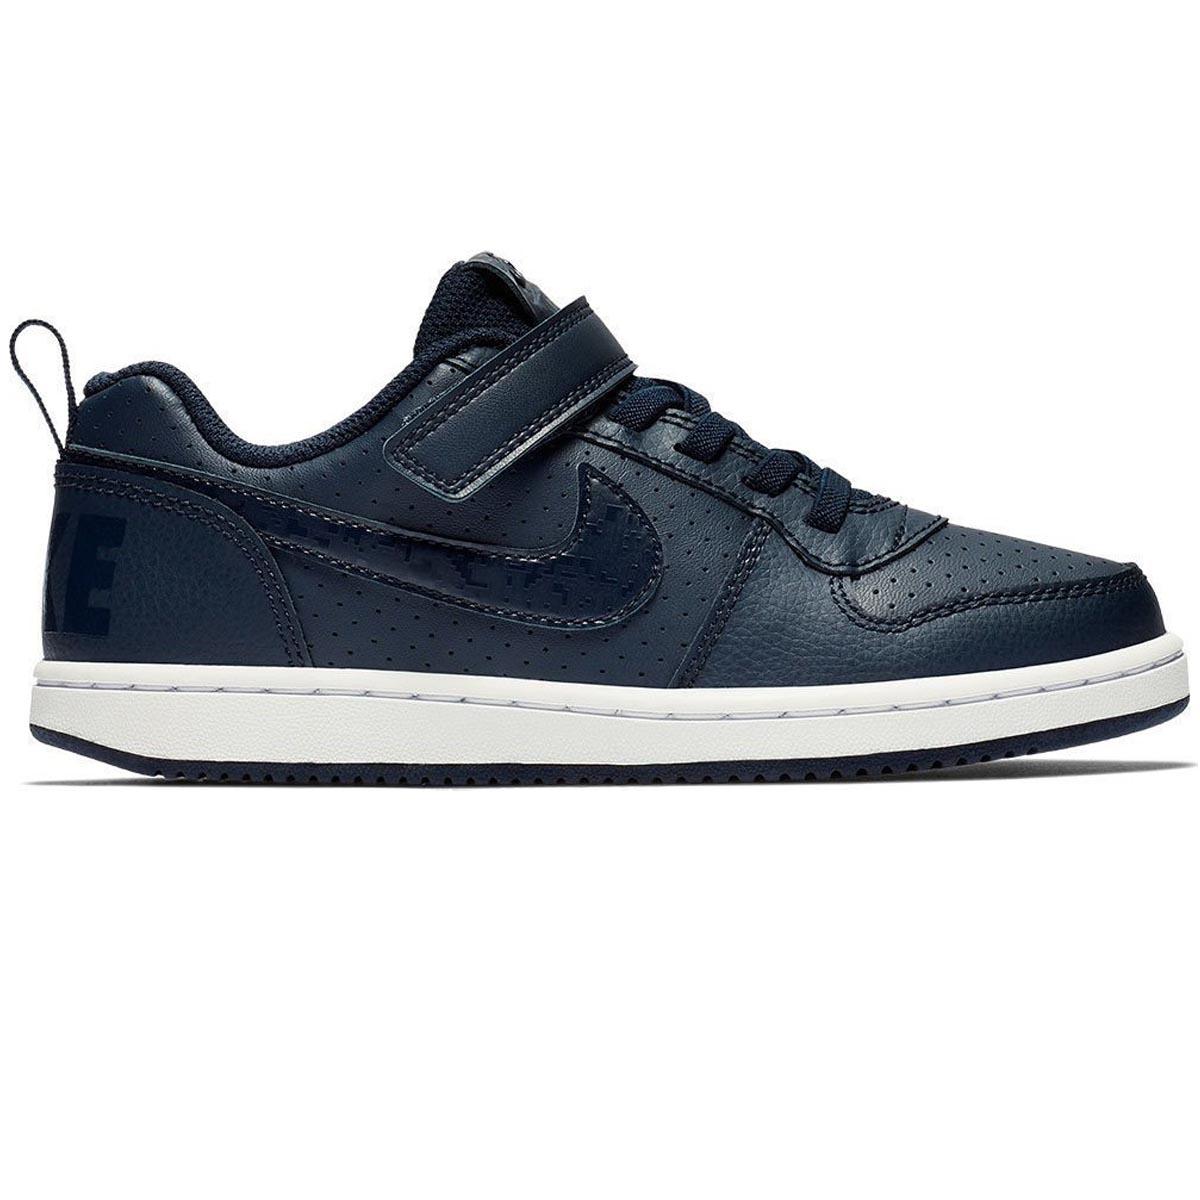 2108d65cc49 Nike NIKE COURT BOROUGH LOW (PSV) AZUL - 870025-403 - Blitstorm